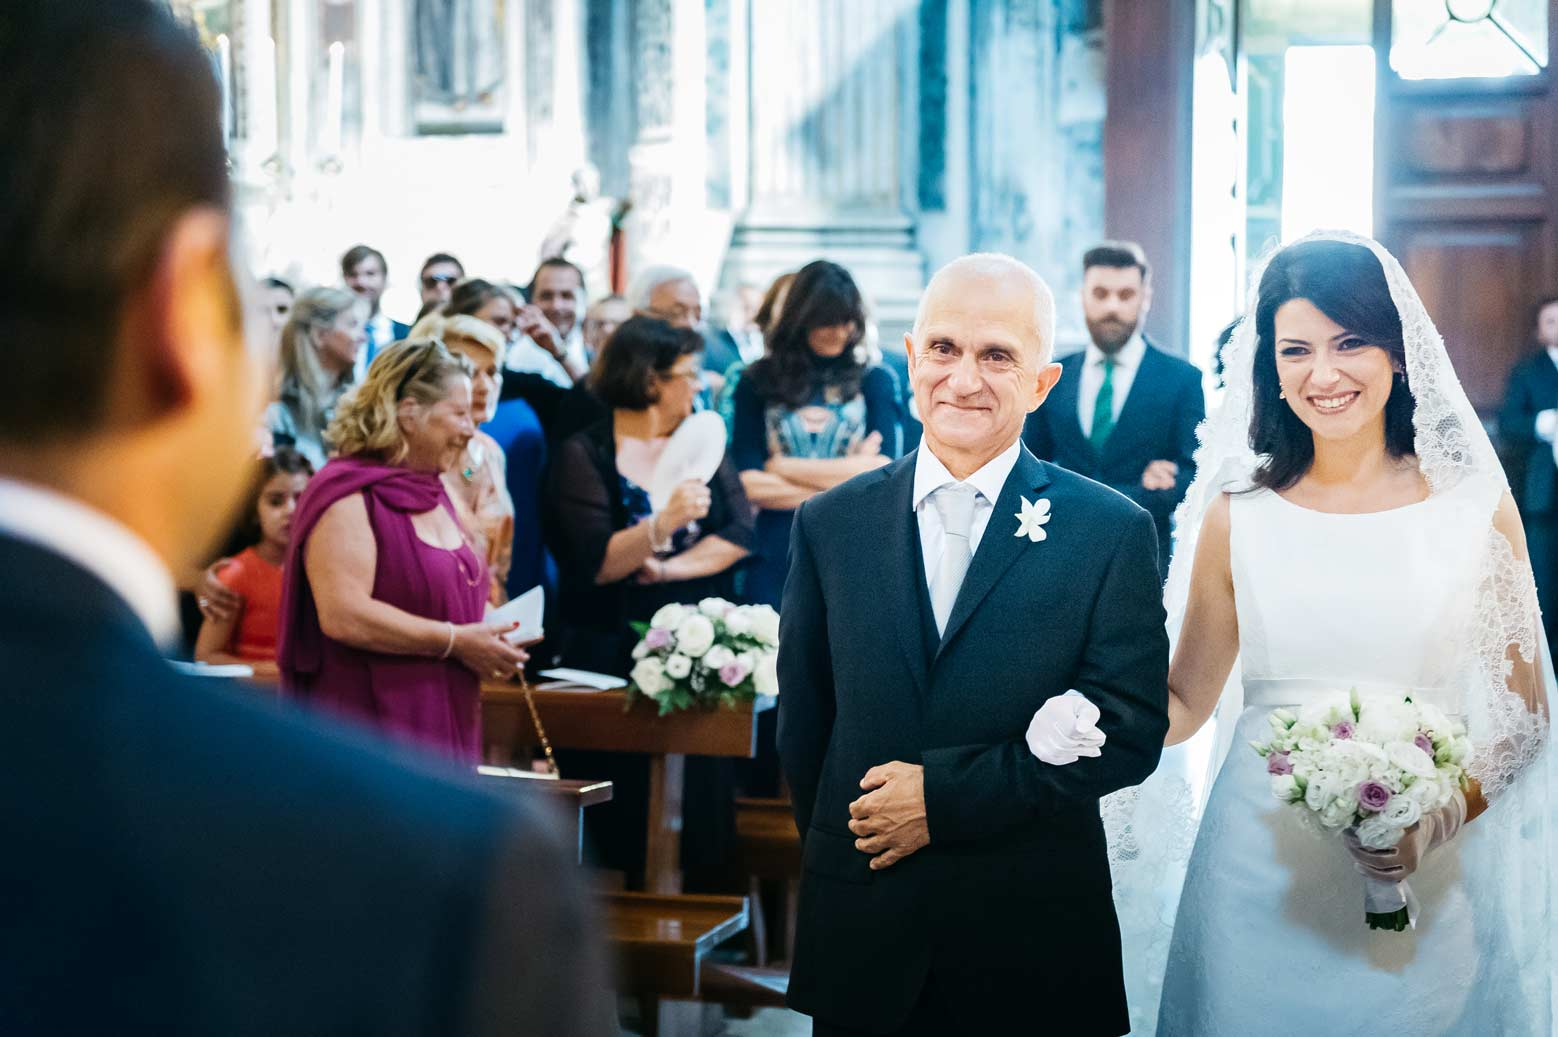 Fotografo-Stile-Reportage-Matrimonio-Roma-Cerimonia